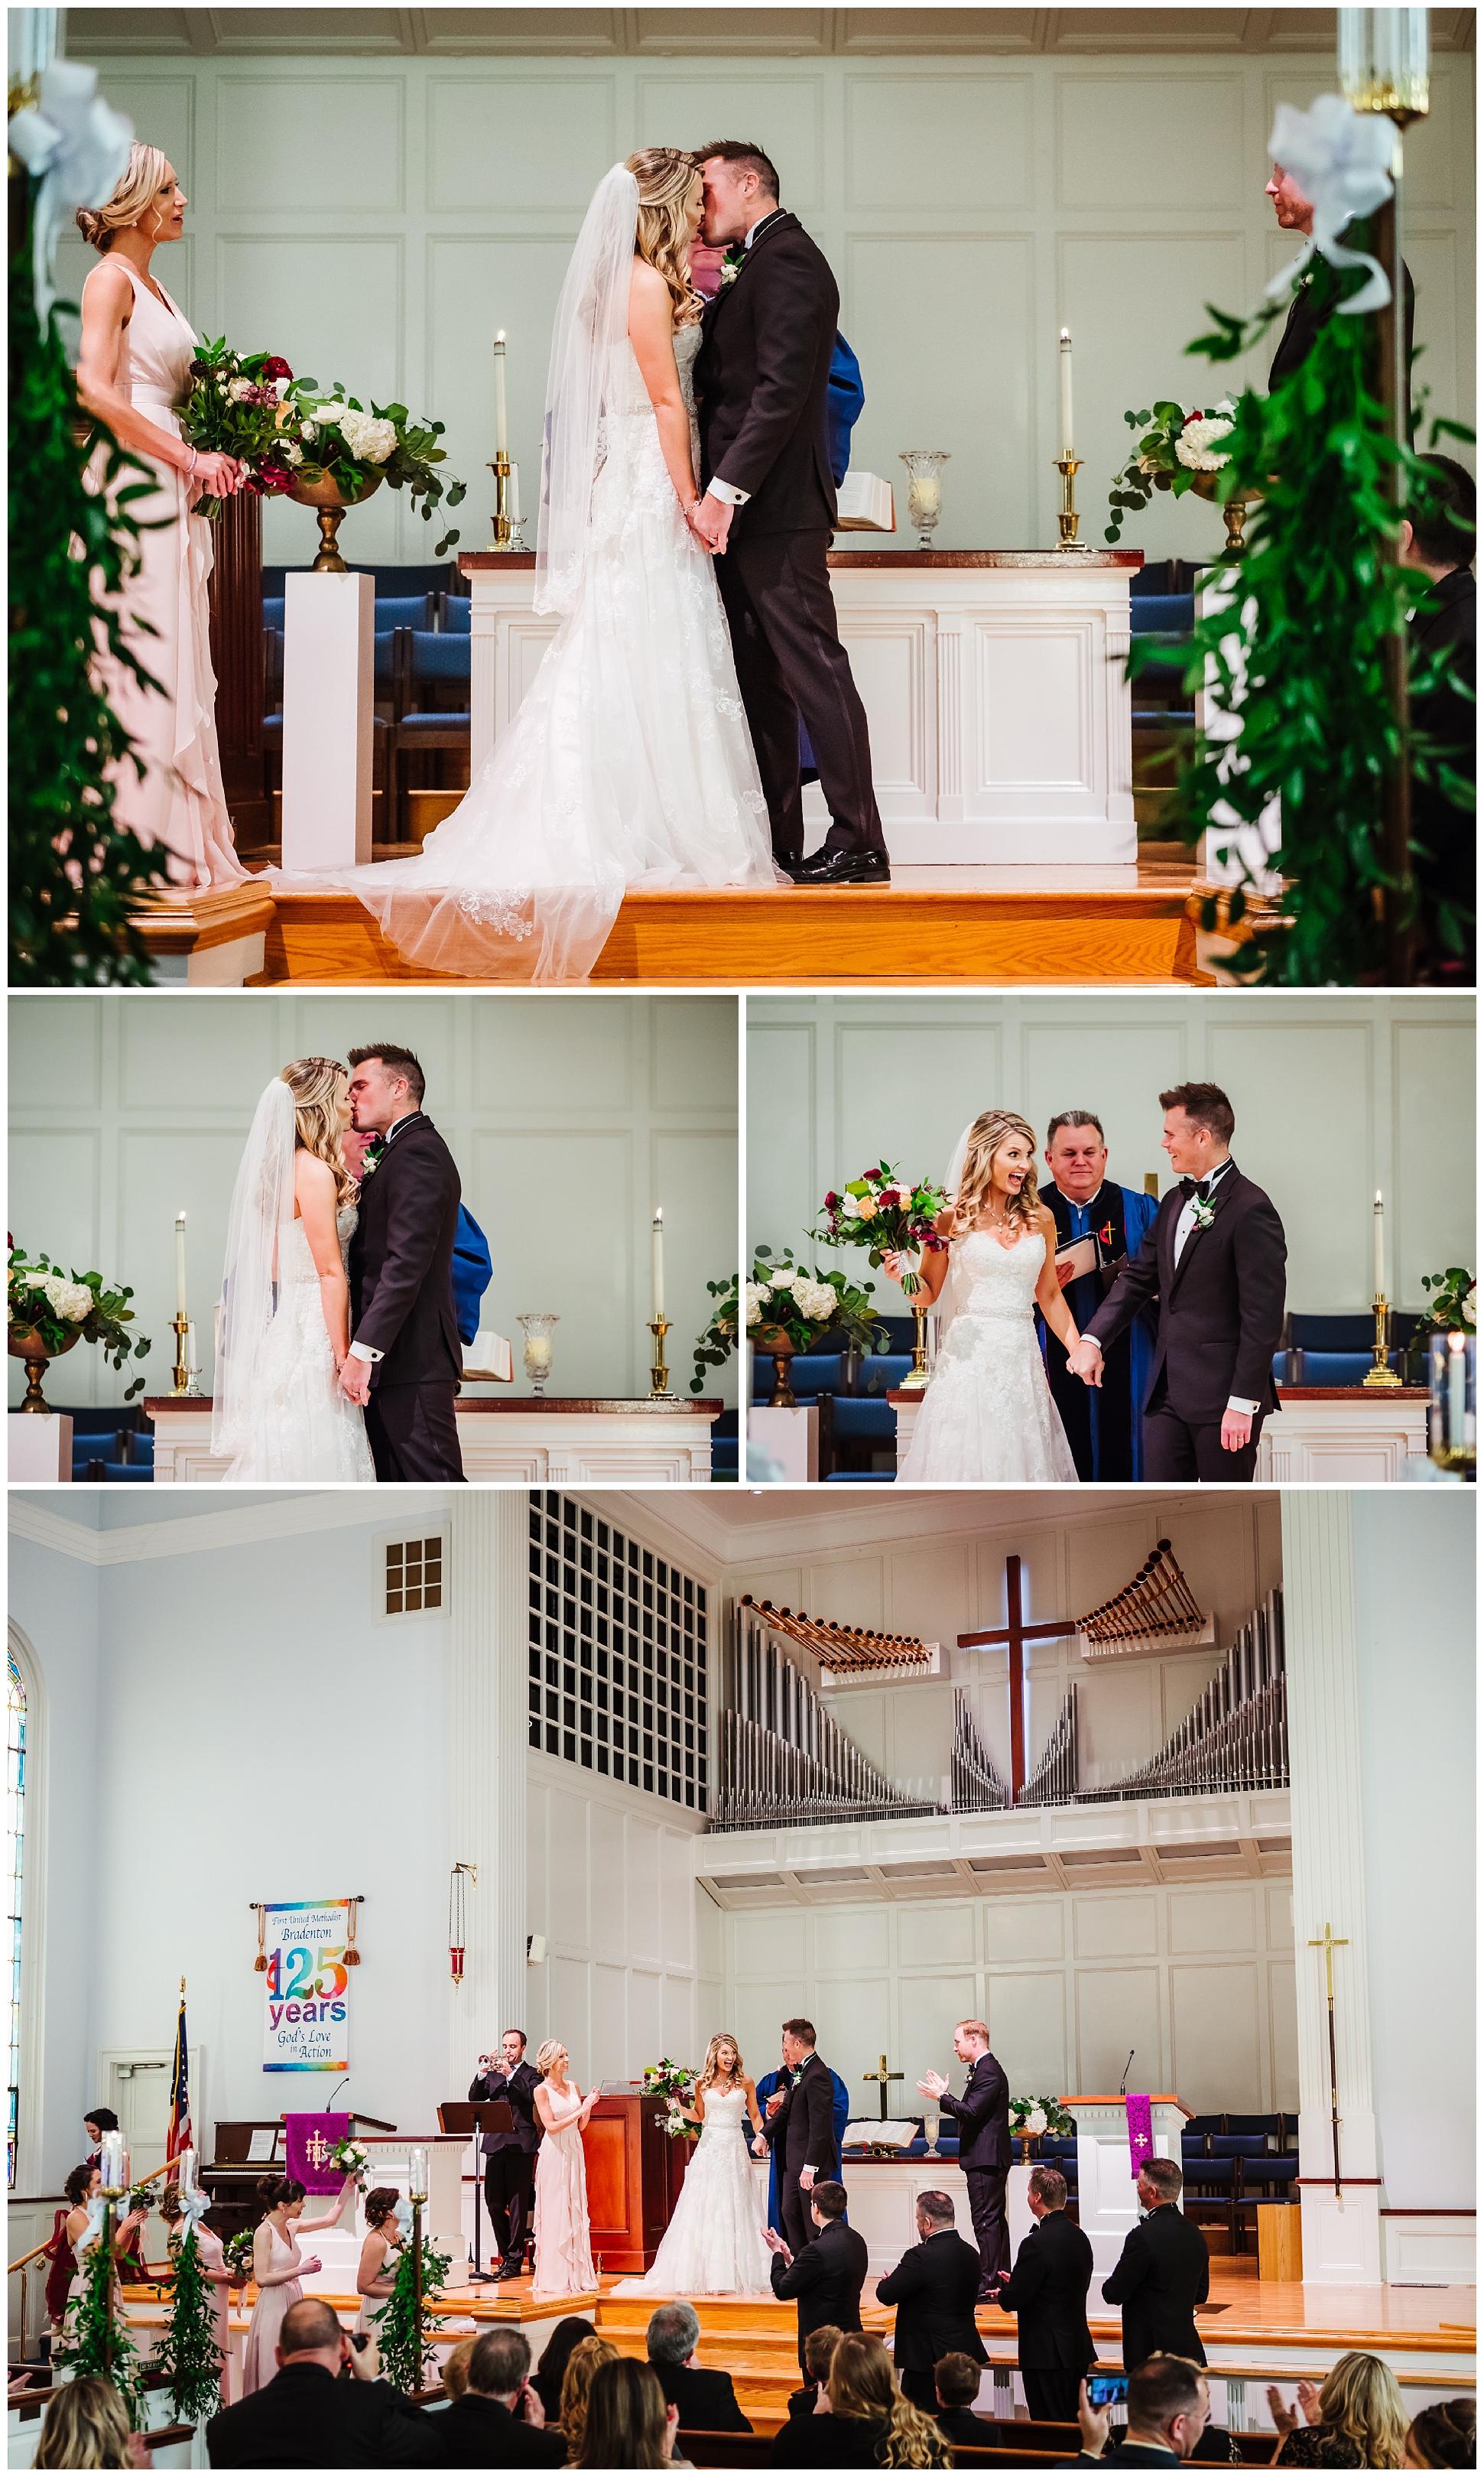 tampa-bradenton-wedding-photographer-south-florida-museum-classic-blush-gold-alpacas-sparklers_0054.jpg